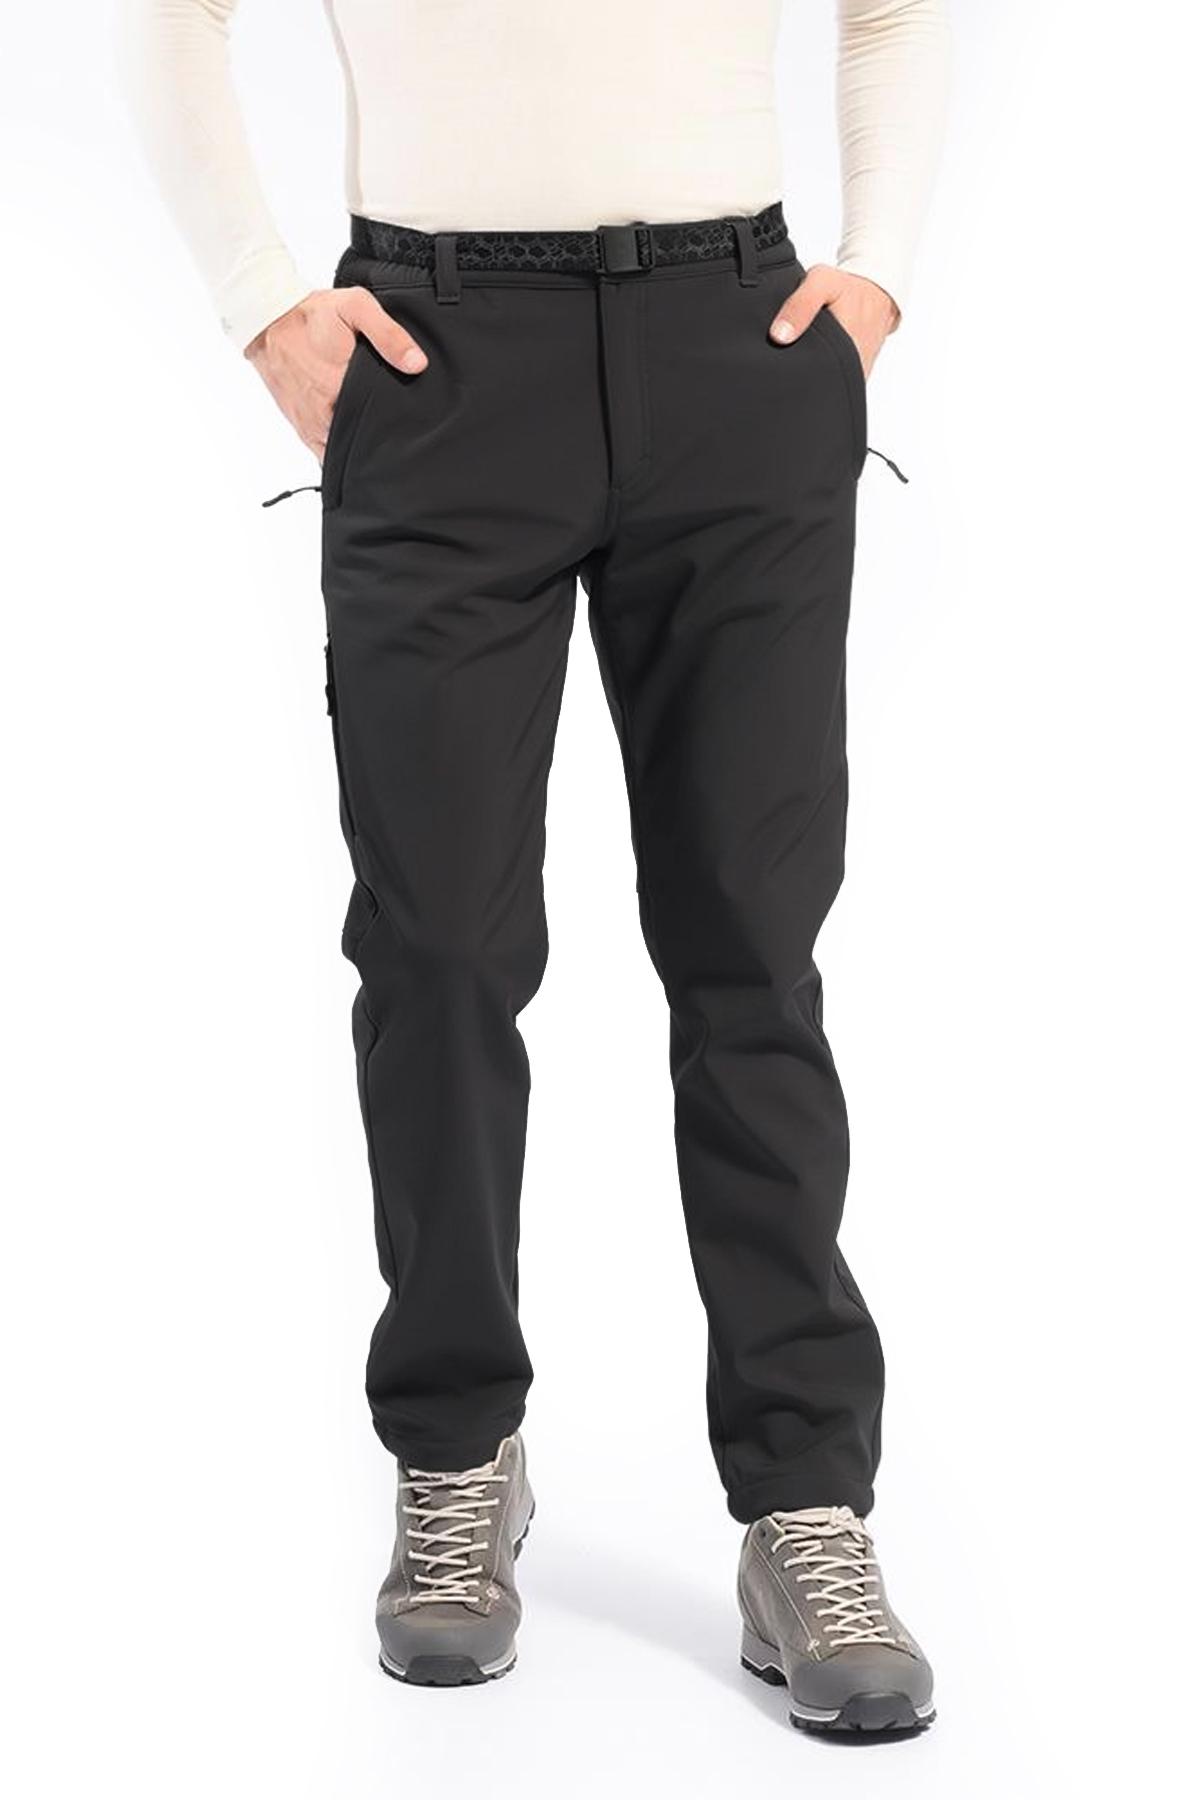 Free Camp Soft Shell Trekking Siyah Pantolon (105138-Sİ)